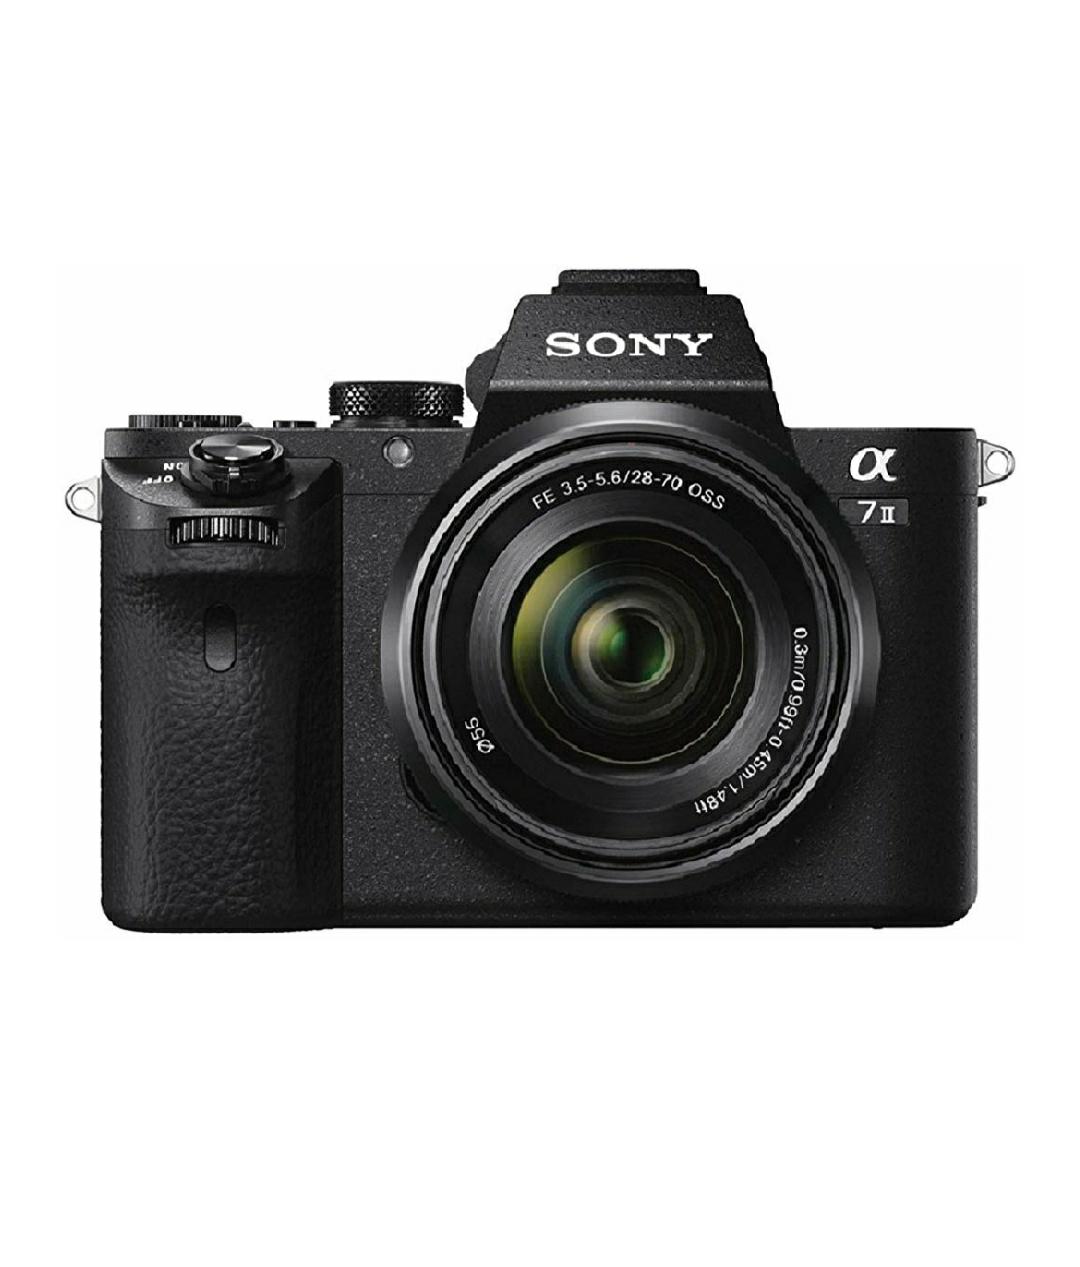 Sony Alpha ILCE-7M2K - Cámara EVIL con montura tipo E y sensor de fotograma completo